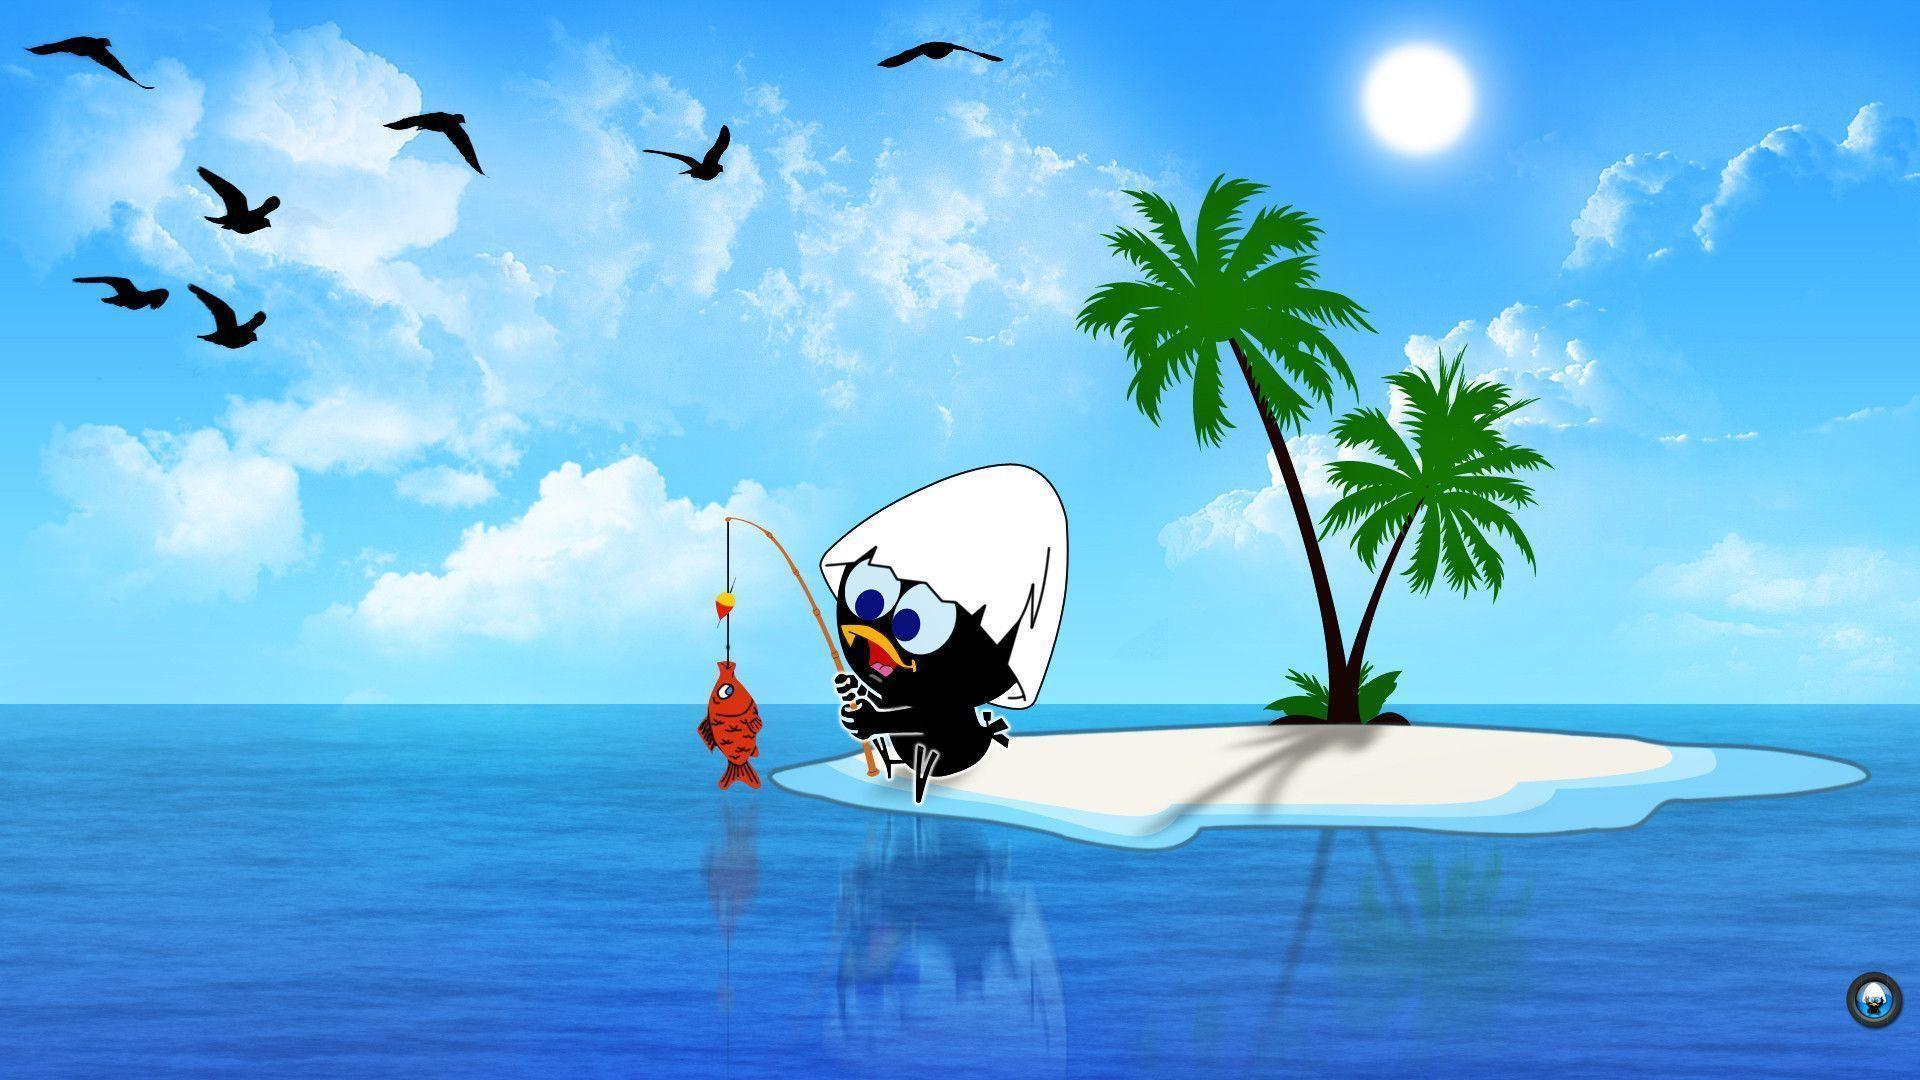 Cute Cartoon Backgrounds Free Download: HD Cartoon Wallpapers